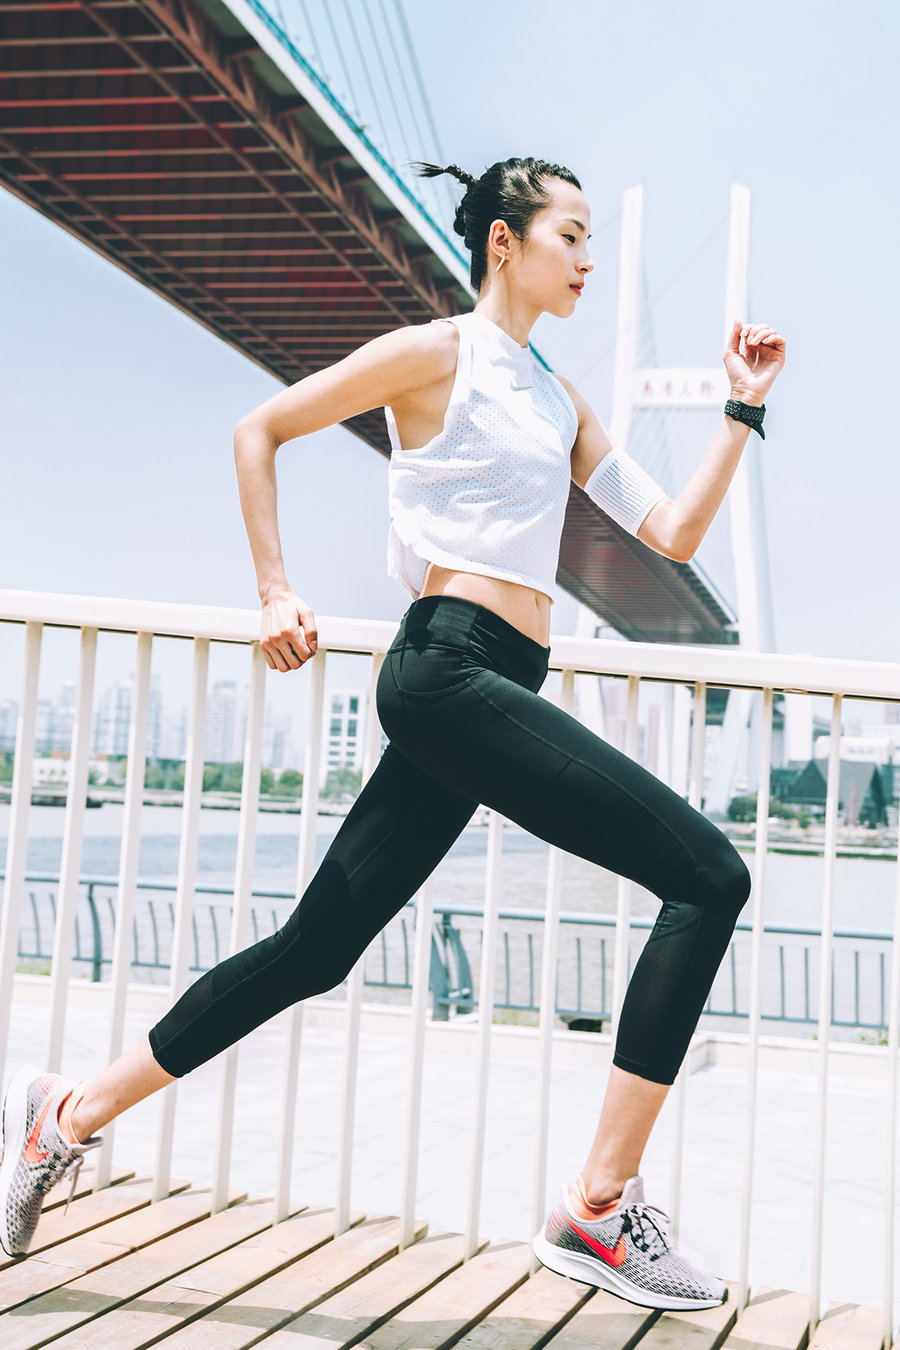 Nike,Air Zoom Pegasus 35  鬼马精灵的超模!将要穿 Nike 新跑鞋挑战半程马拉松!